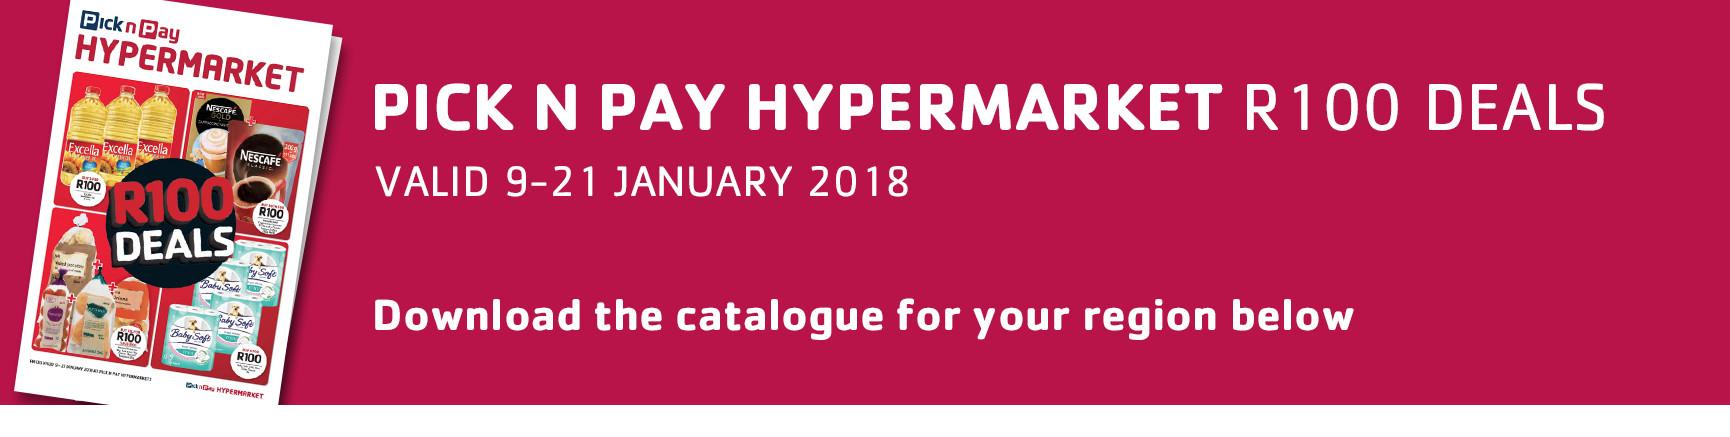 PICK N PAY HYPERMARKET R100 DEALS 2018 (1).jpg